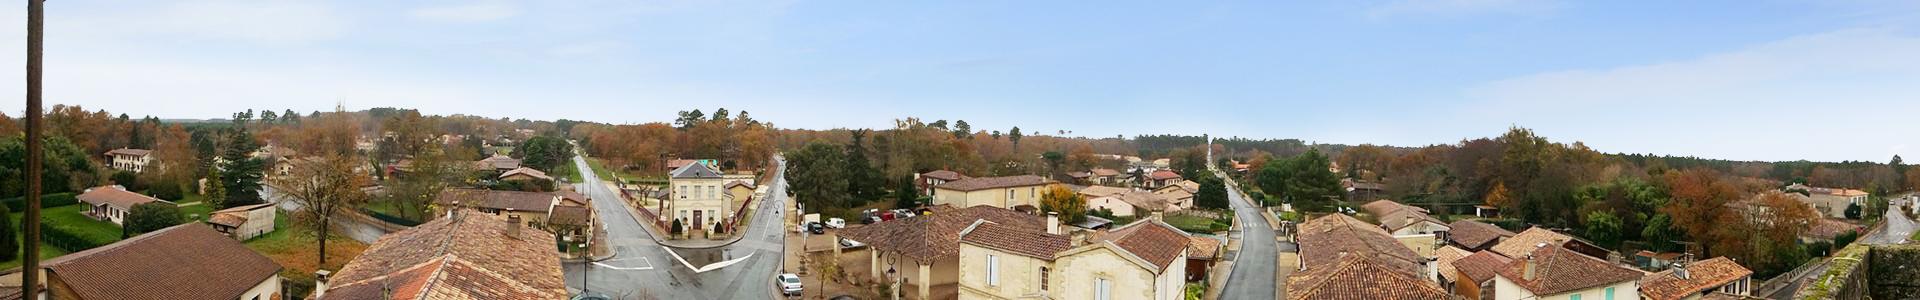 https://www.saintmichel-de-rieufret.fr/wp-content/uploads/2015/03/panoramique-saint-michel-de-rieufret-1920x3001.jpg